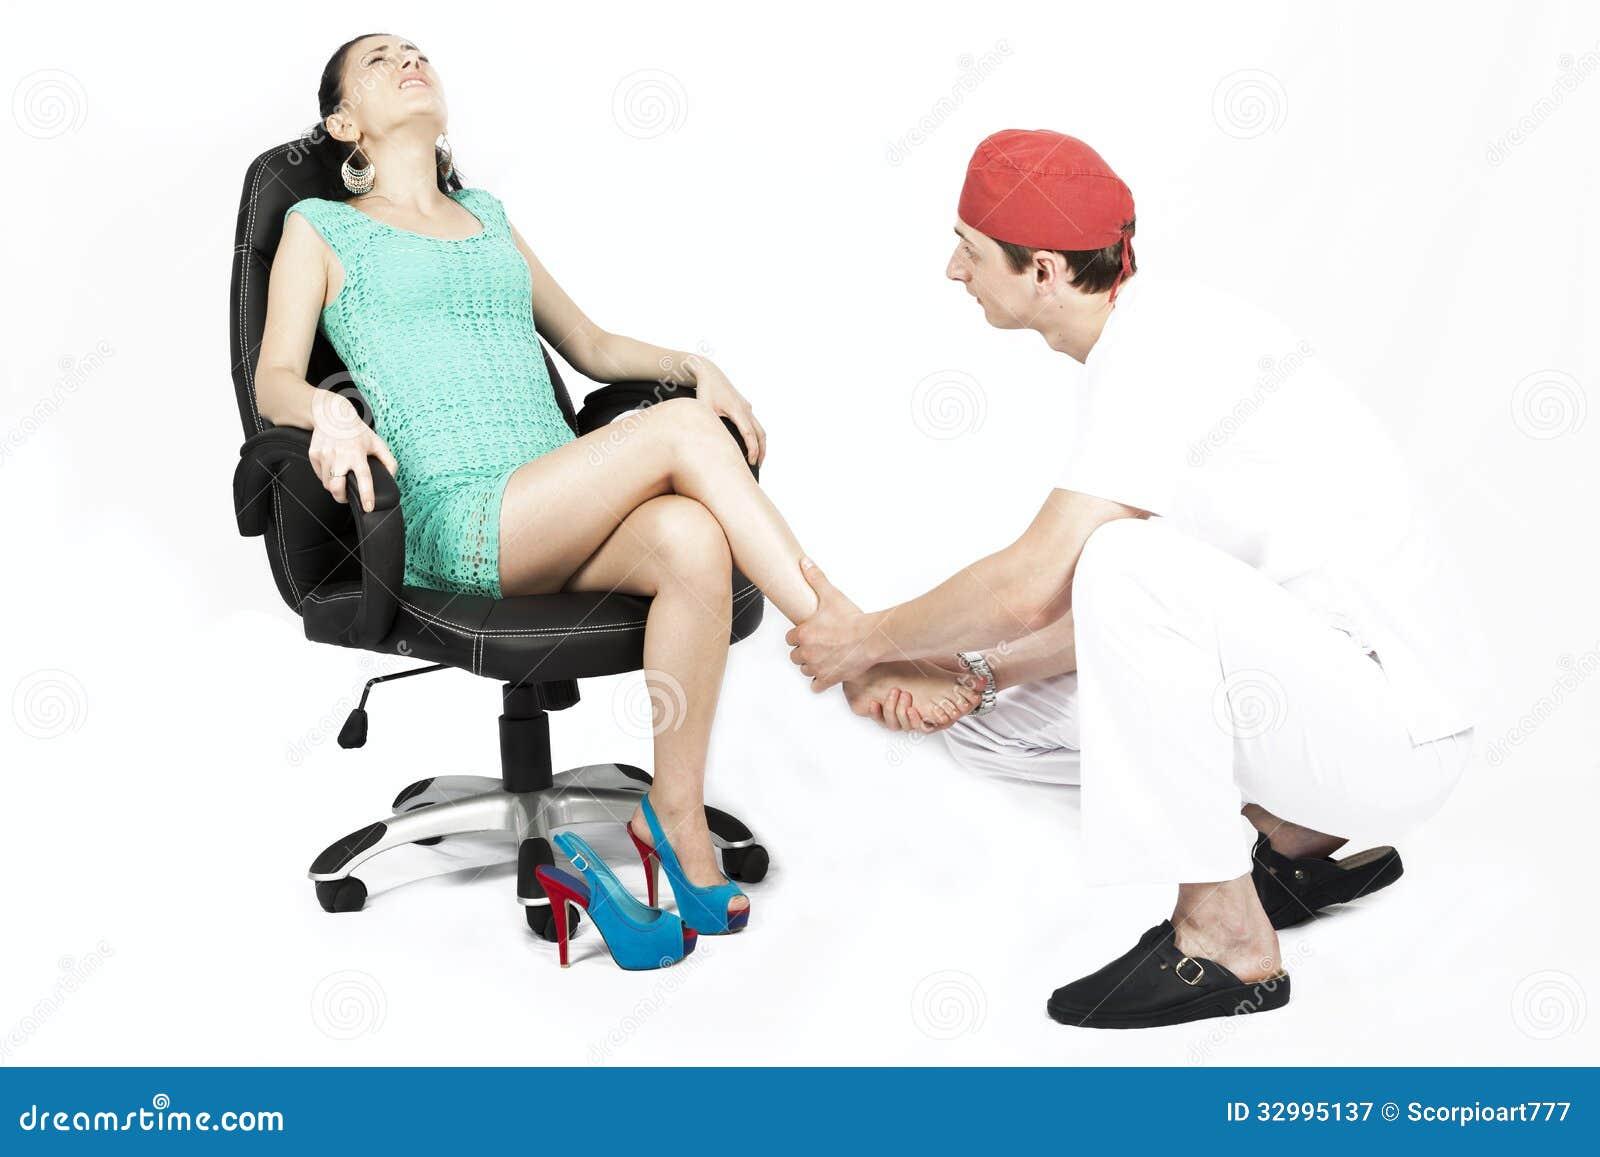 High Heels Sexy Women